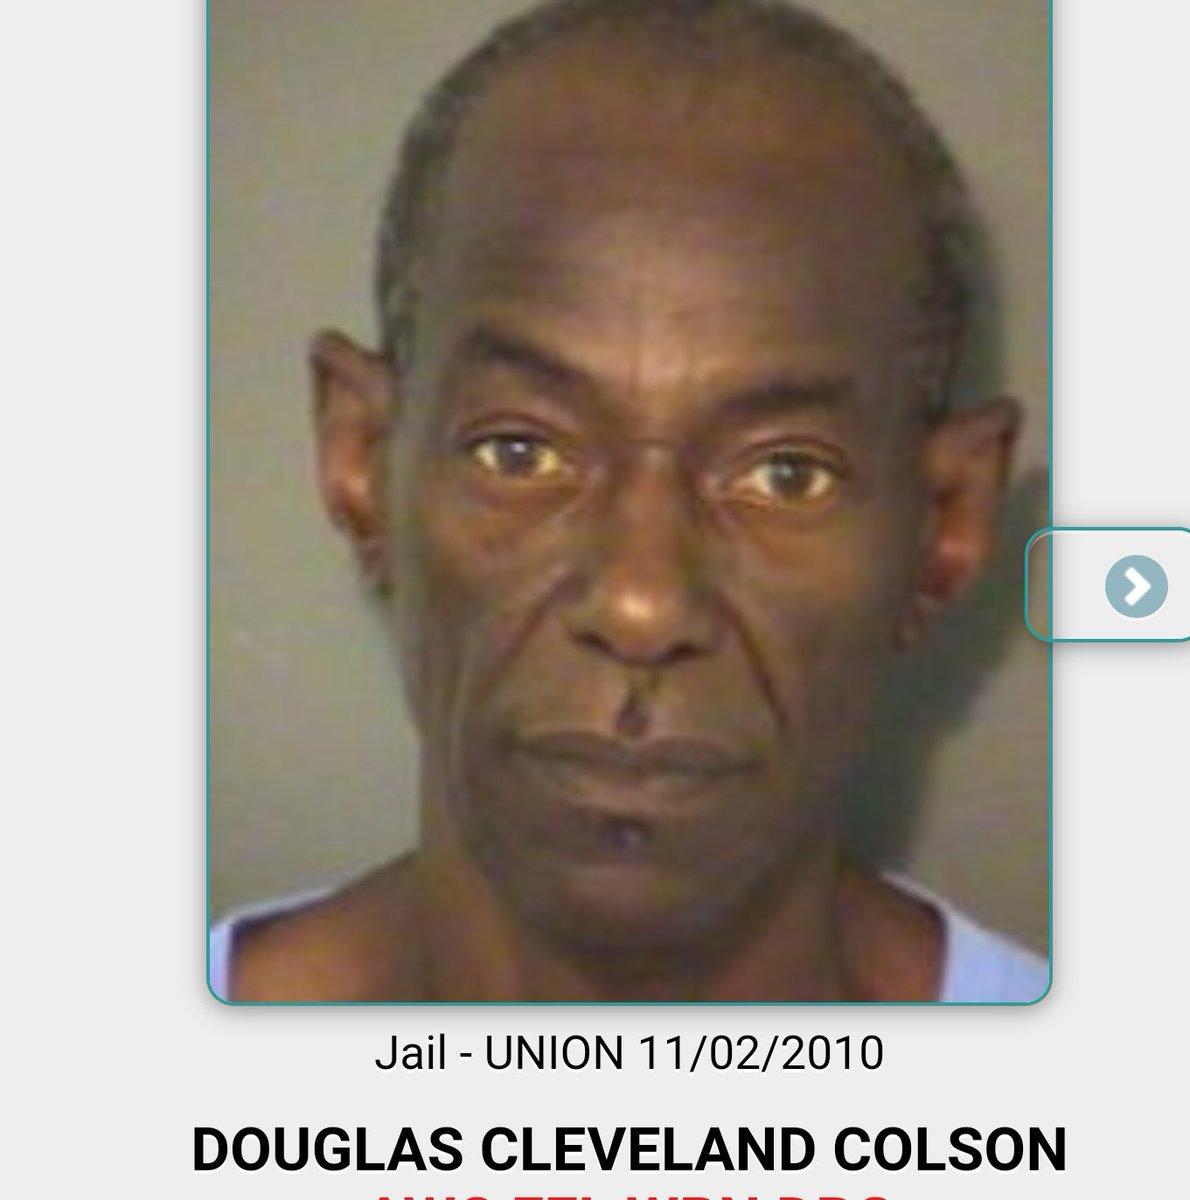 Douglas Cleveland Colson